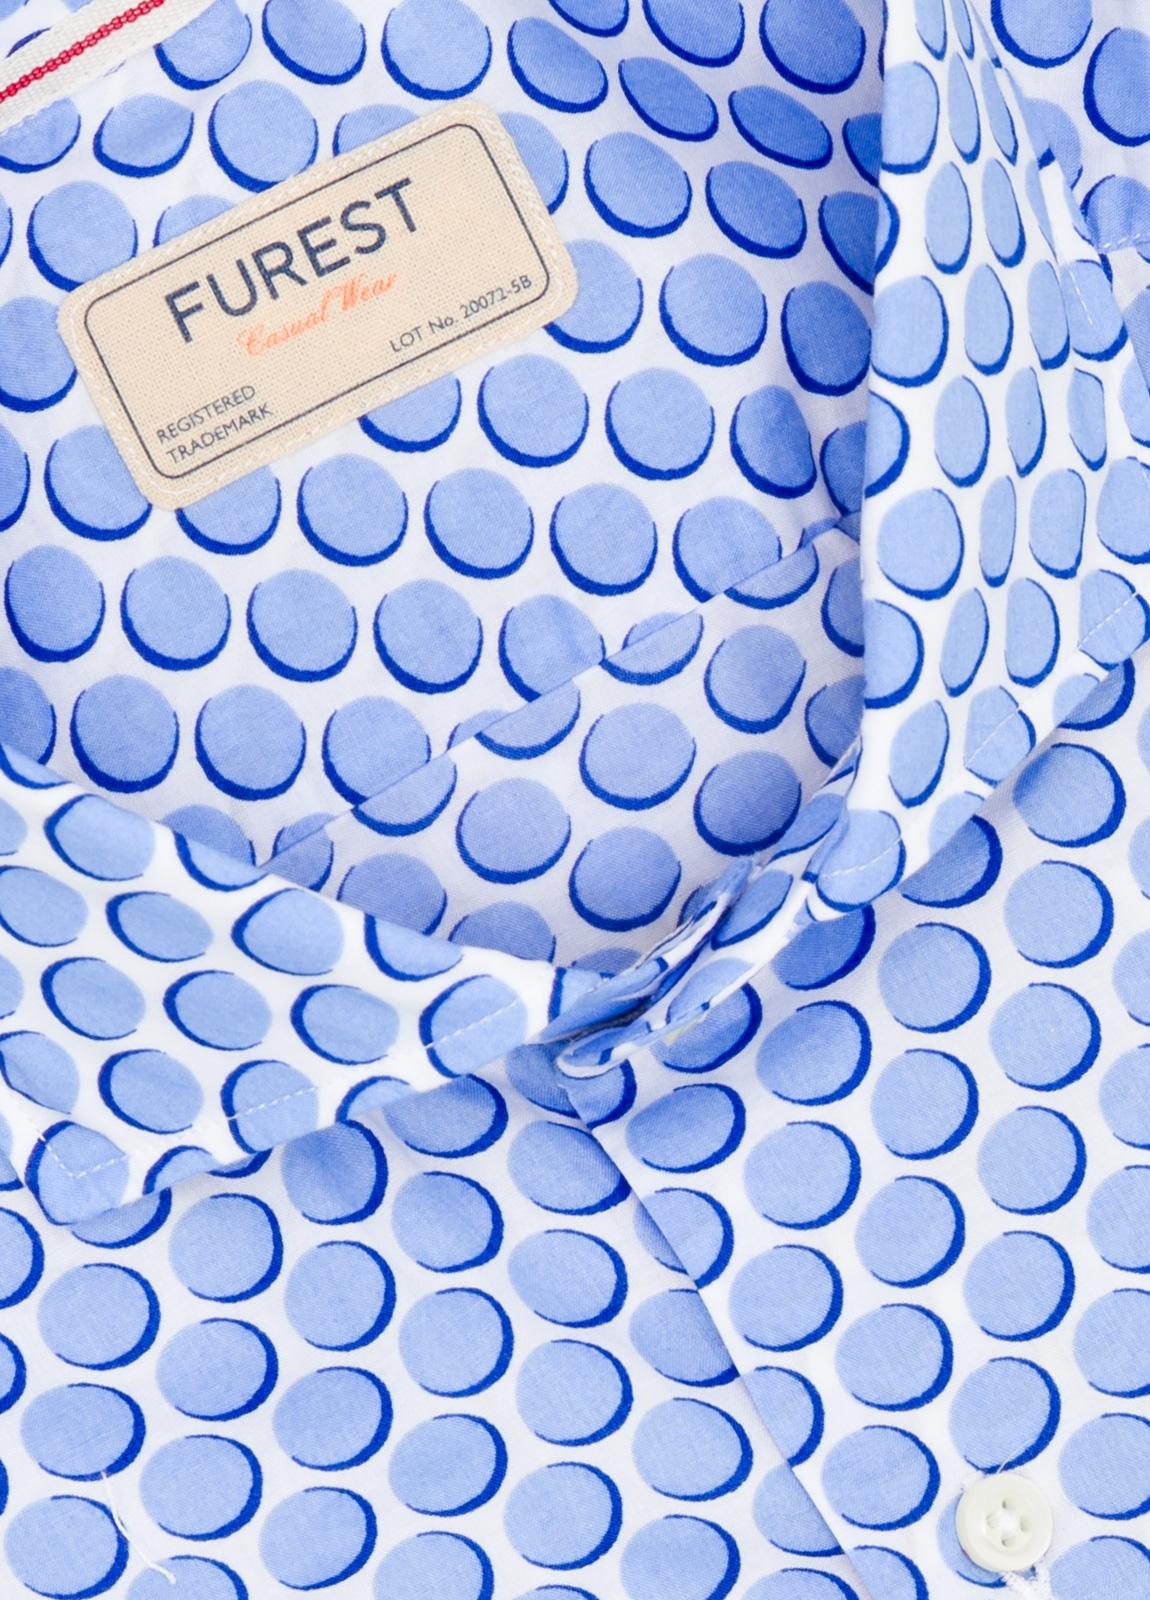 Camisa Casual Wear SLIM FIT Modelo CAPRI maxi dibujo lunar color azul. 100% Algodón. - Ítem1